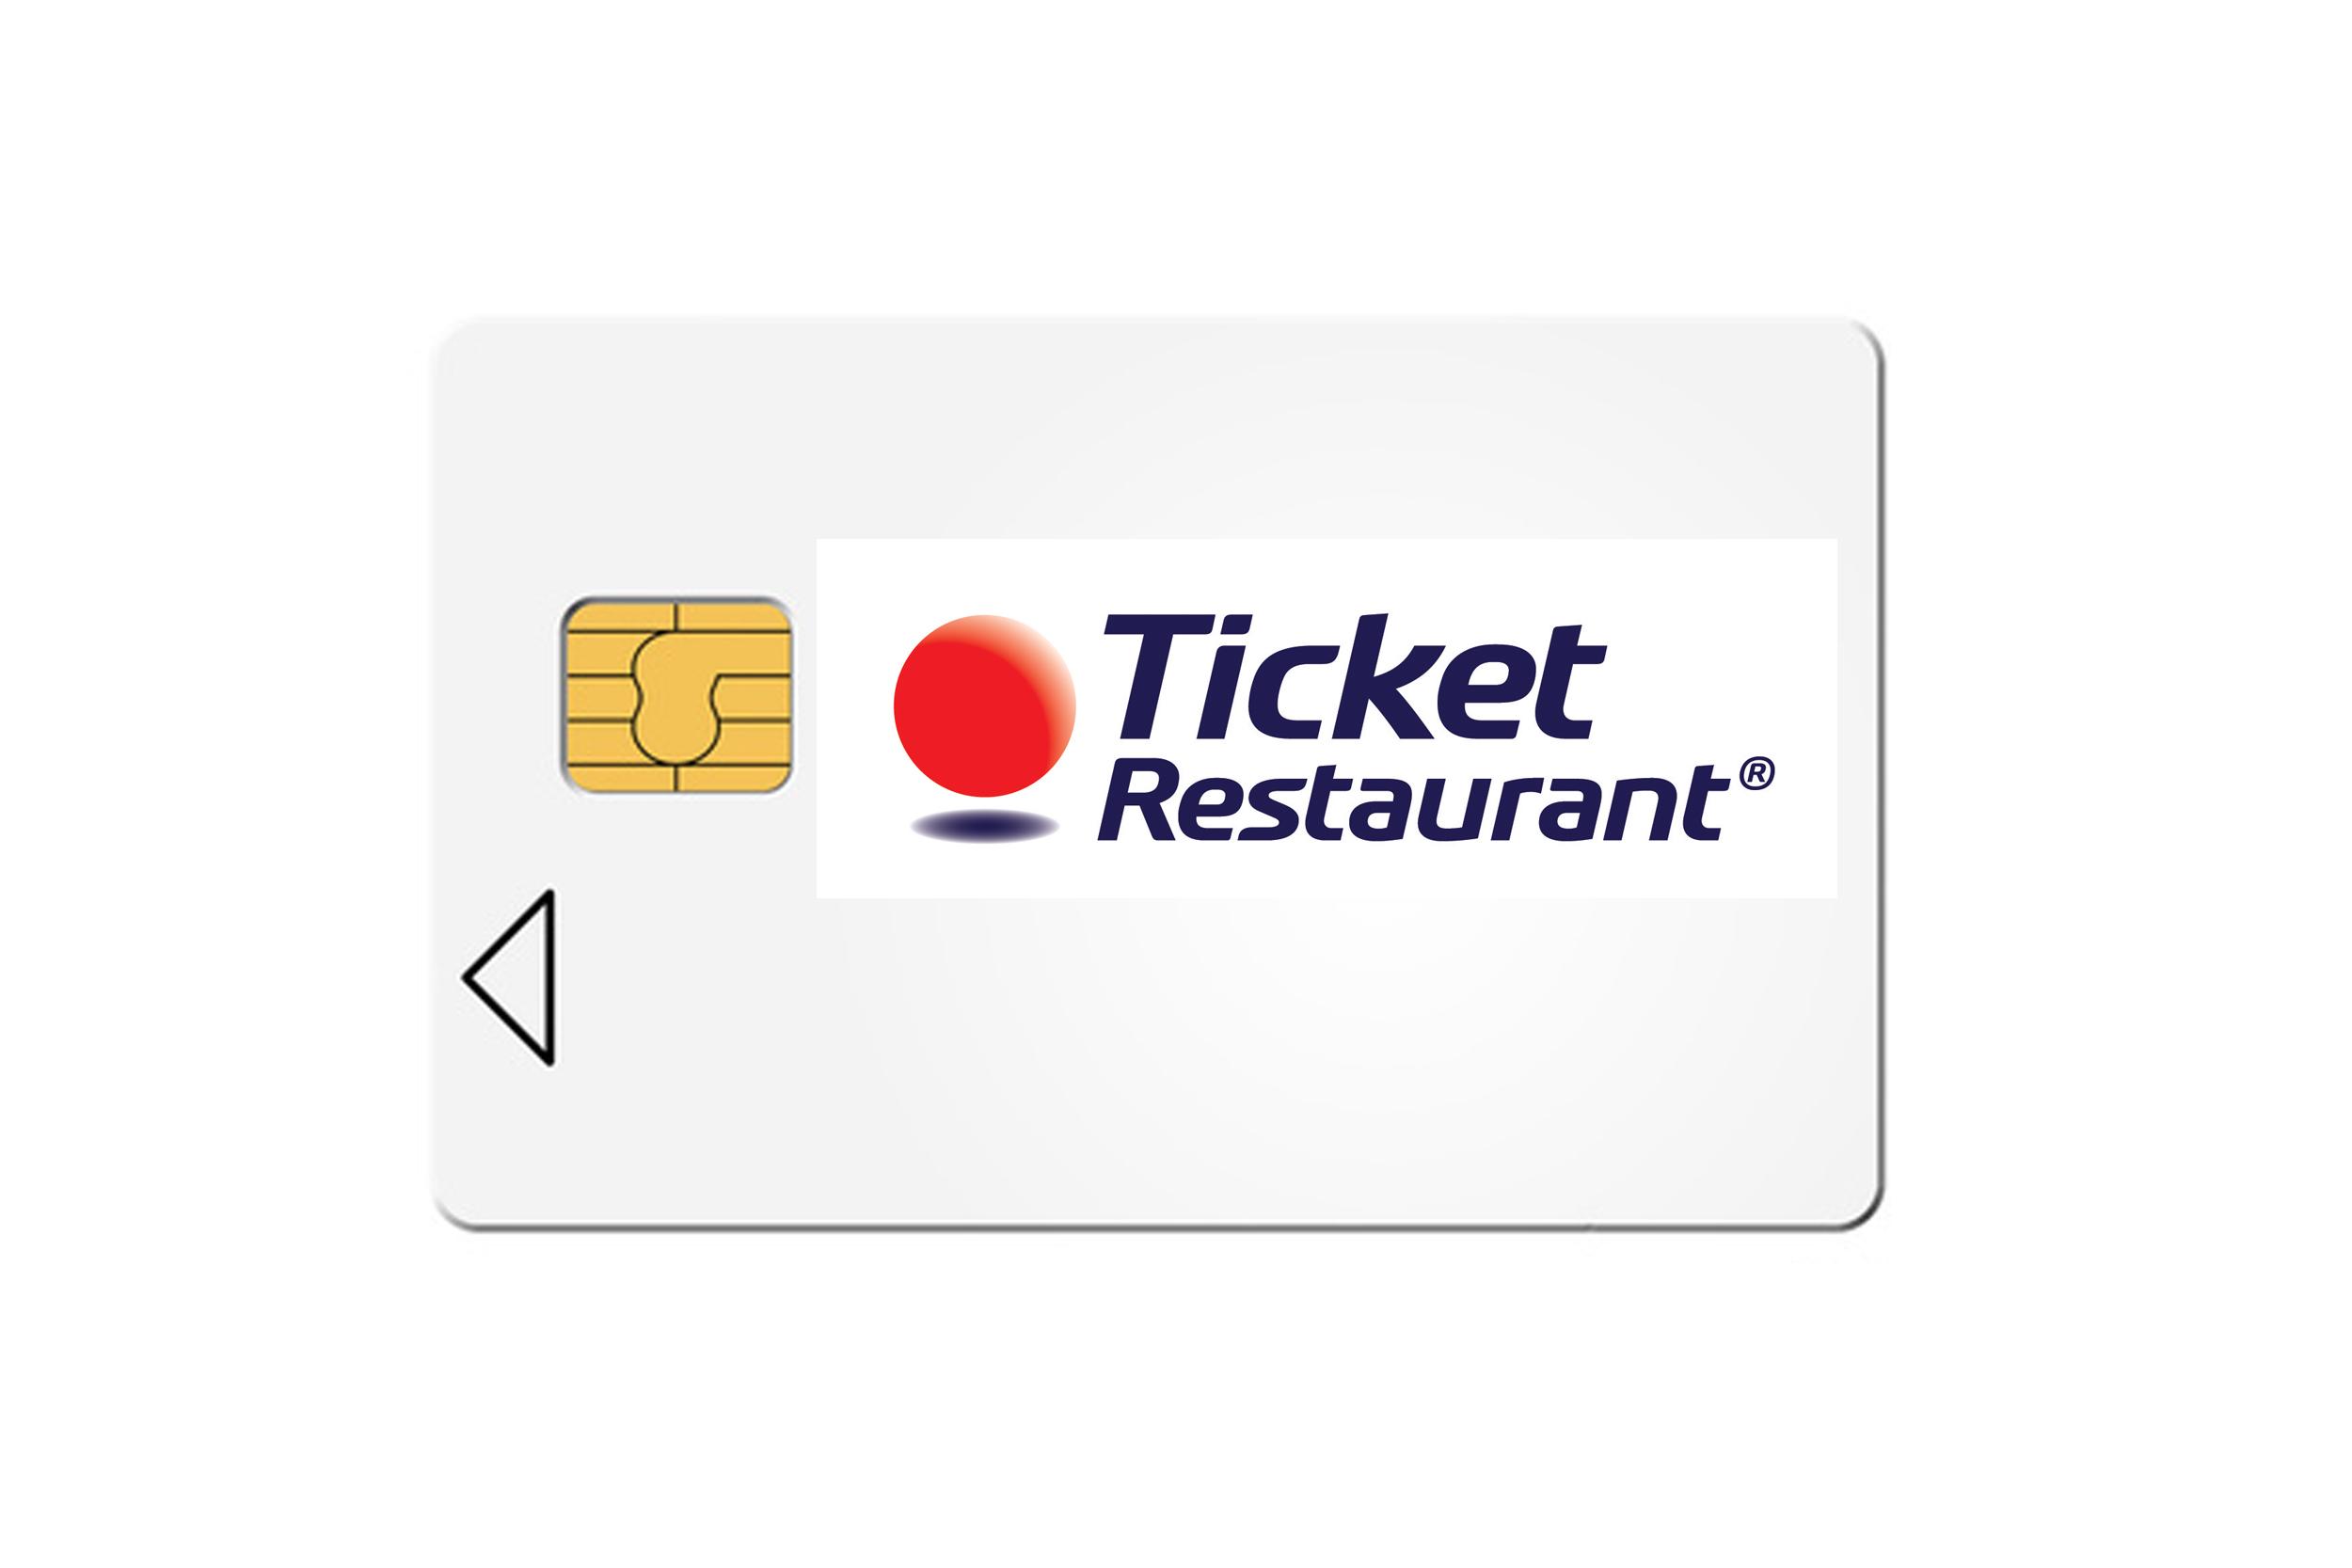 Carte Ticket Restaurant Sodexo.Dematerialisation Des Tickets Restaurant La Fausse Bonne